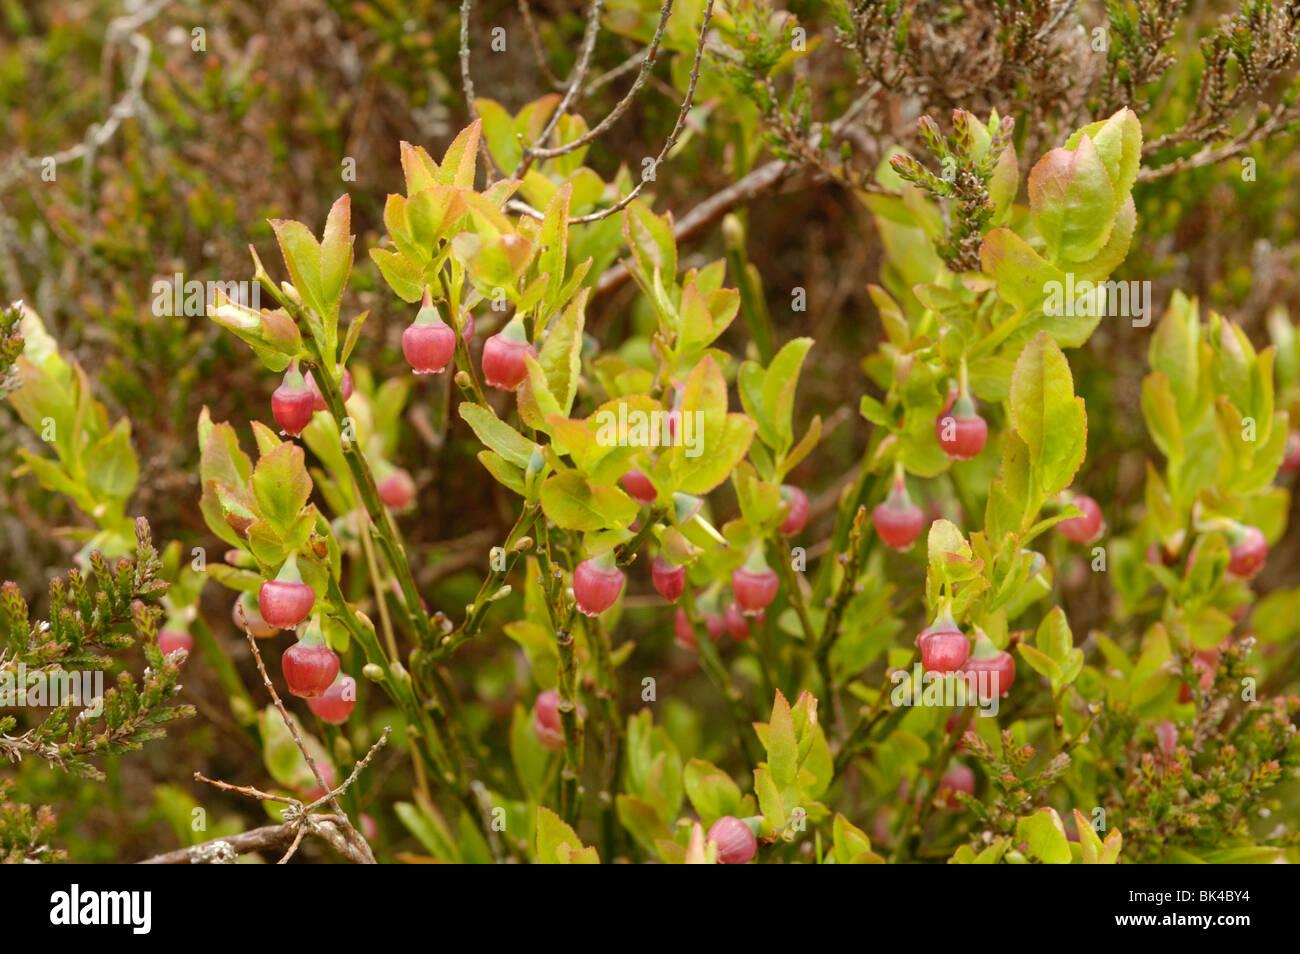 Bilberry - Stock Image